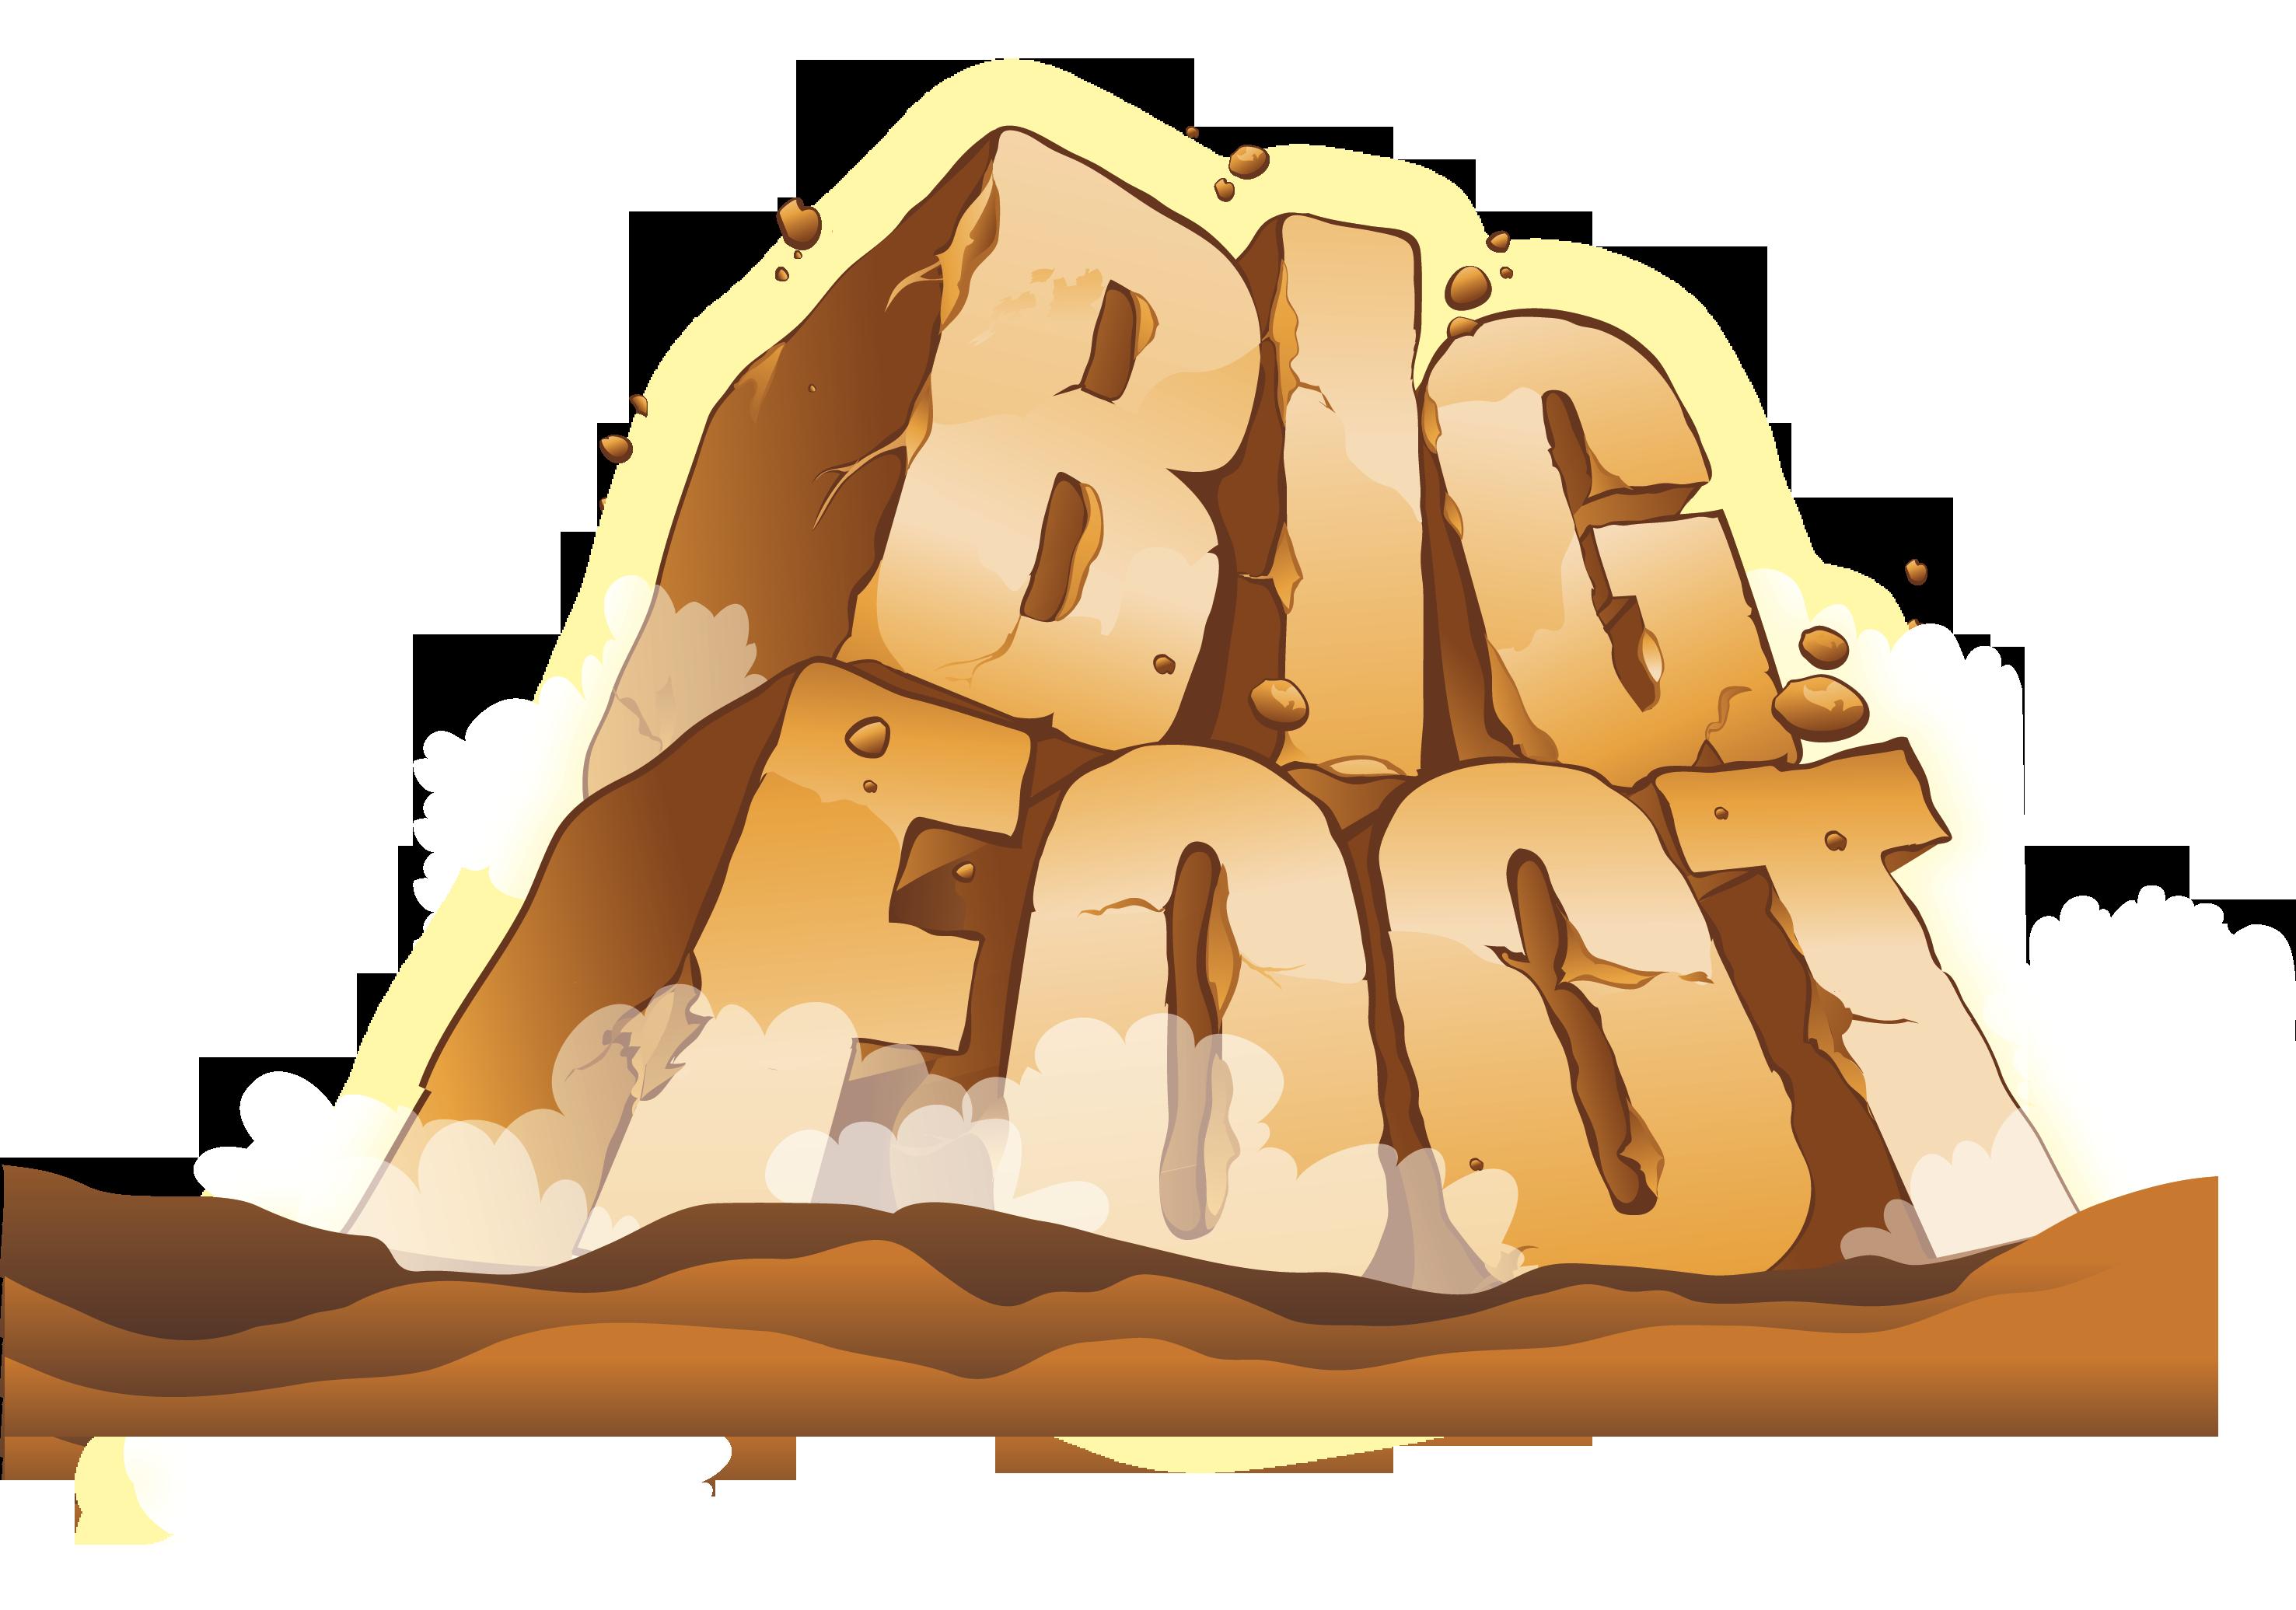 Bigfoot online slot title. Foot clipart giant foot